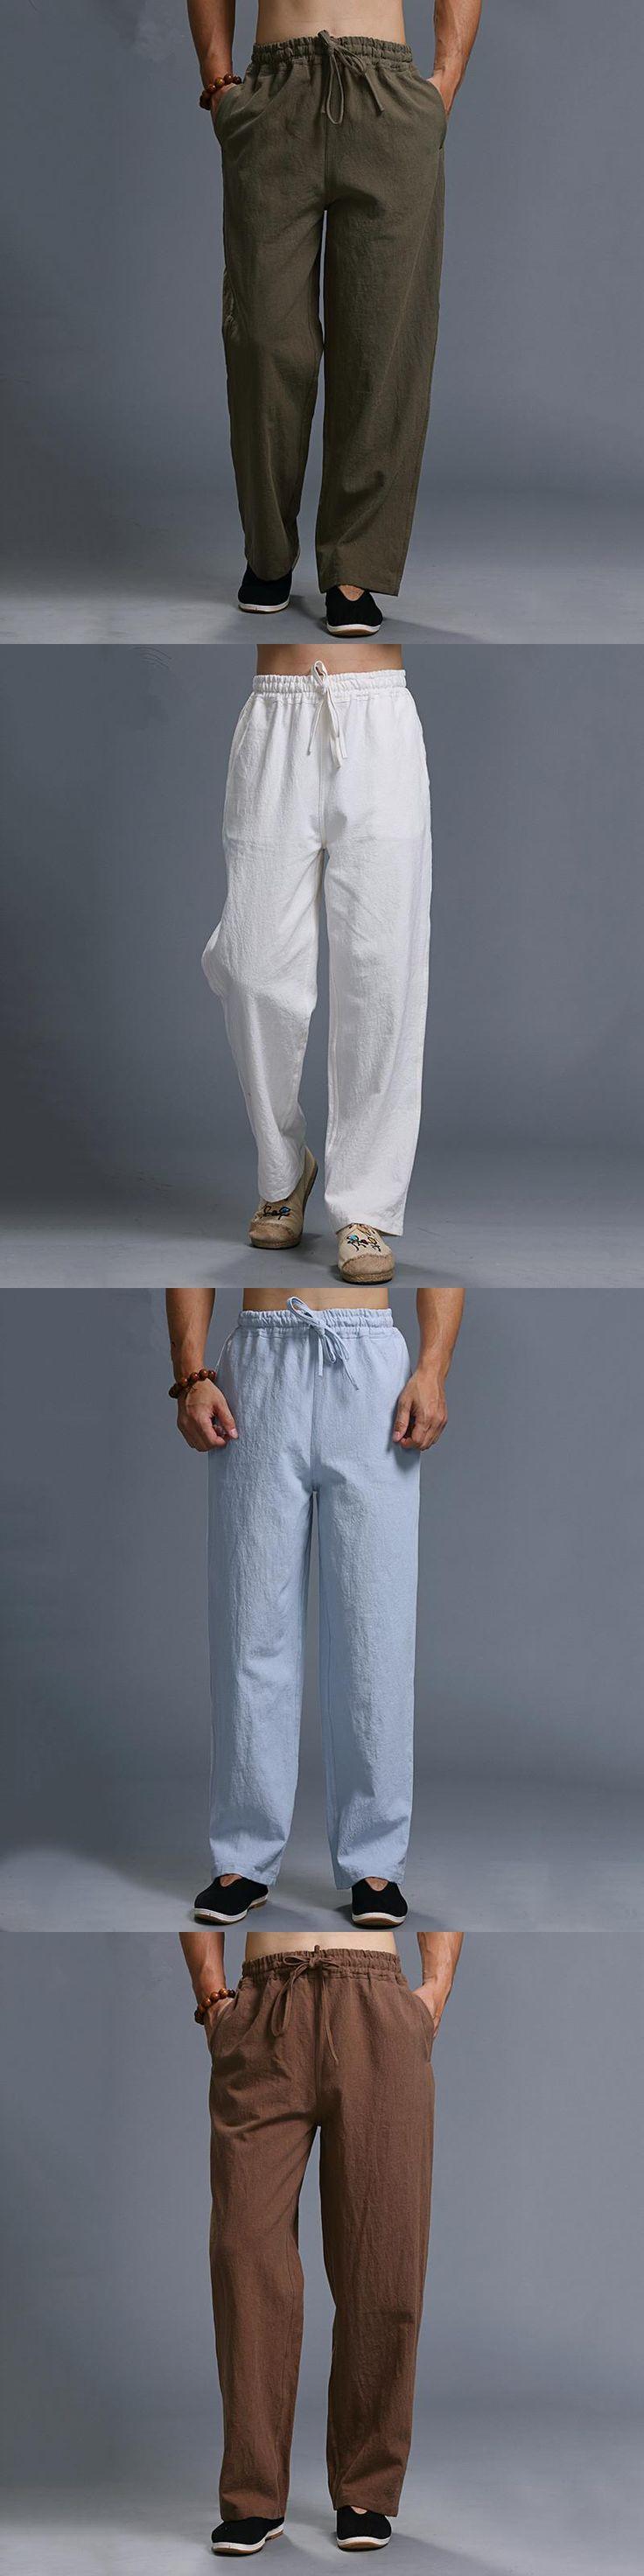 New Style Casual linen pants men brand Trousers Fashion men linen pants cargo pants Men Trousers long pantalon homme